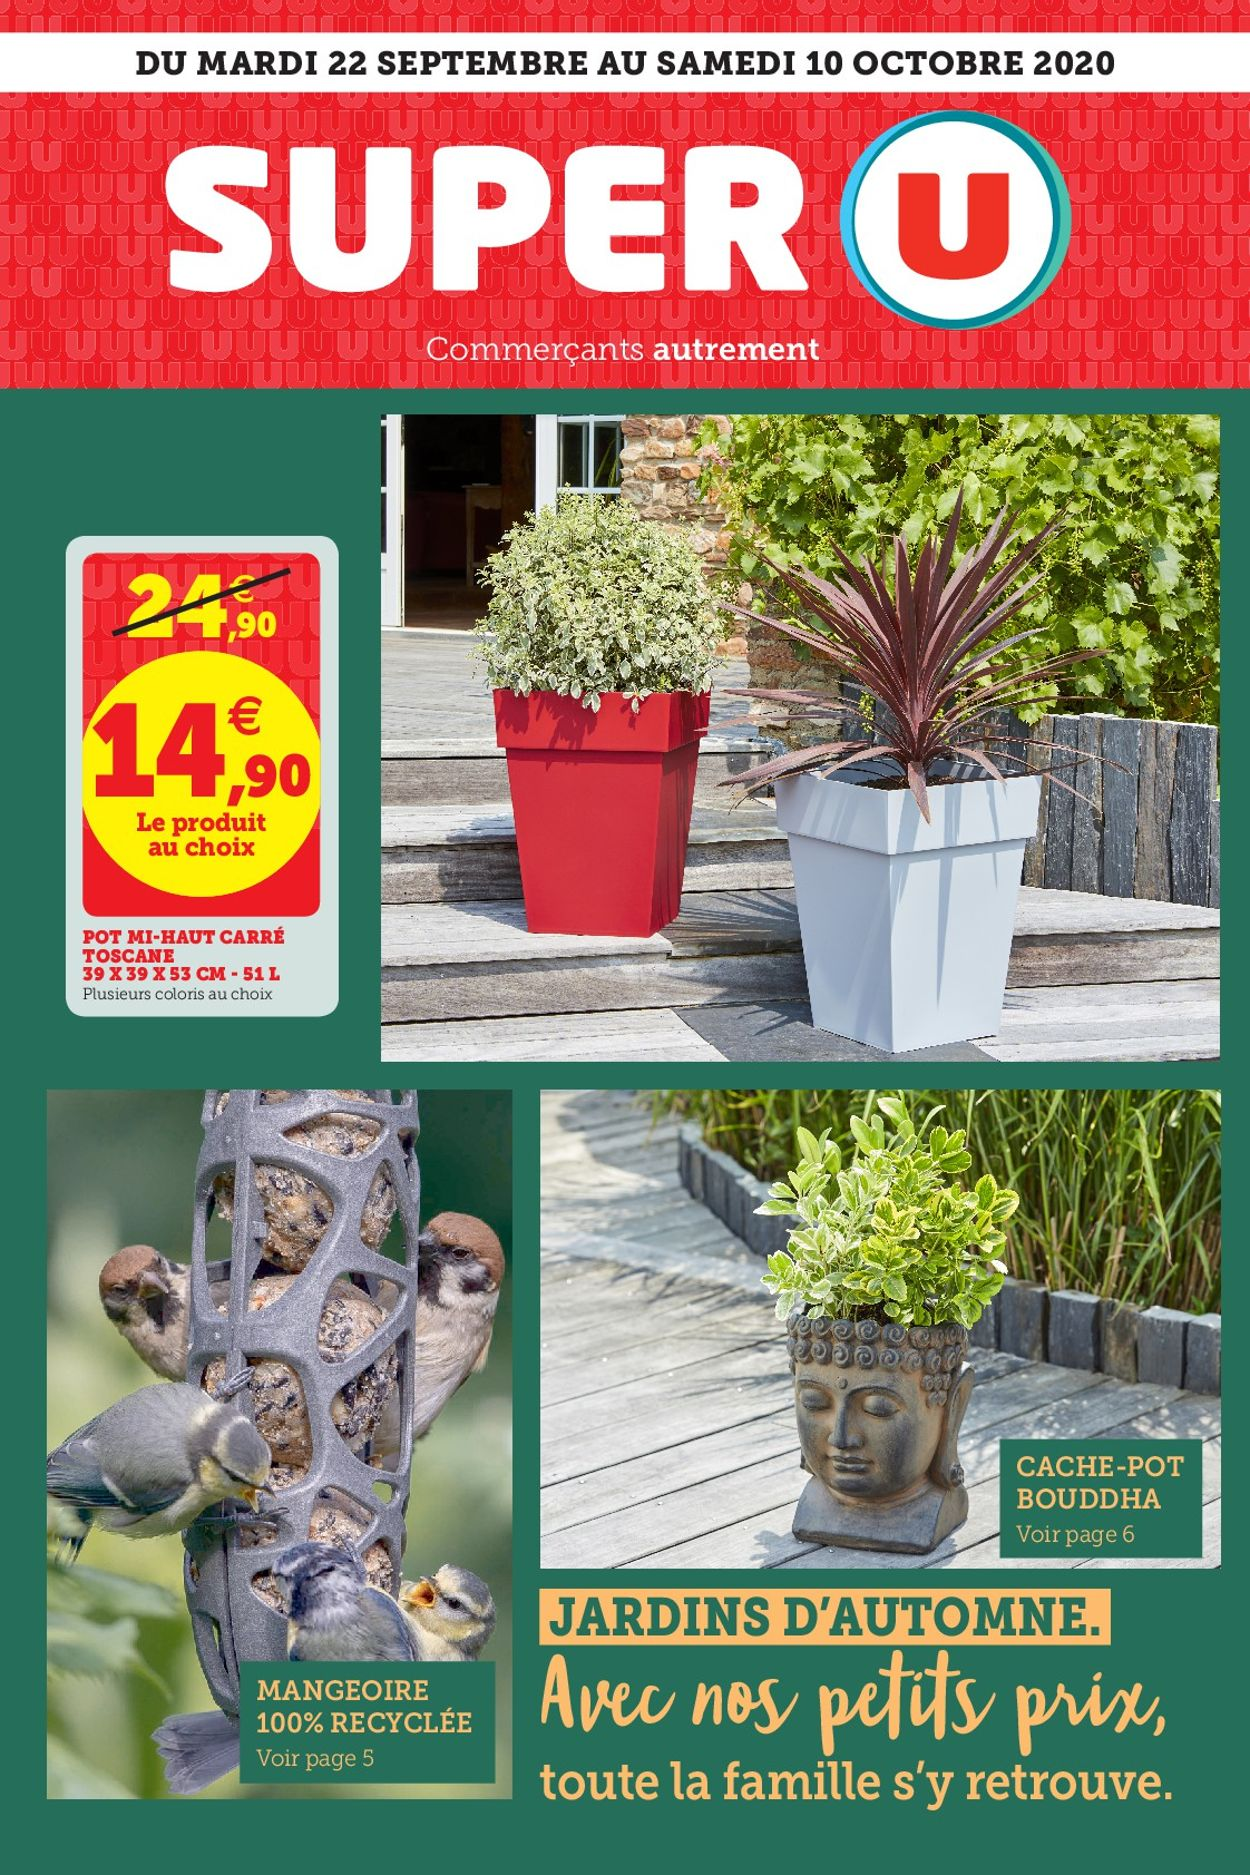 Magasins U Catalogue - 22.09-10.10.2020